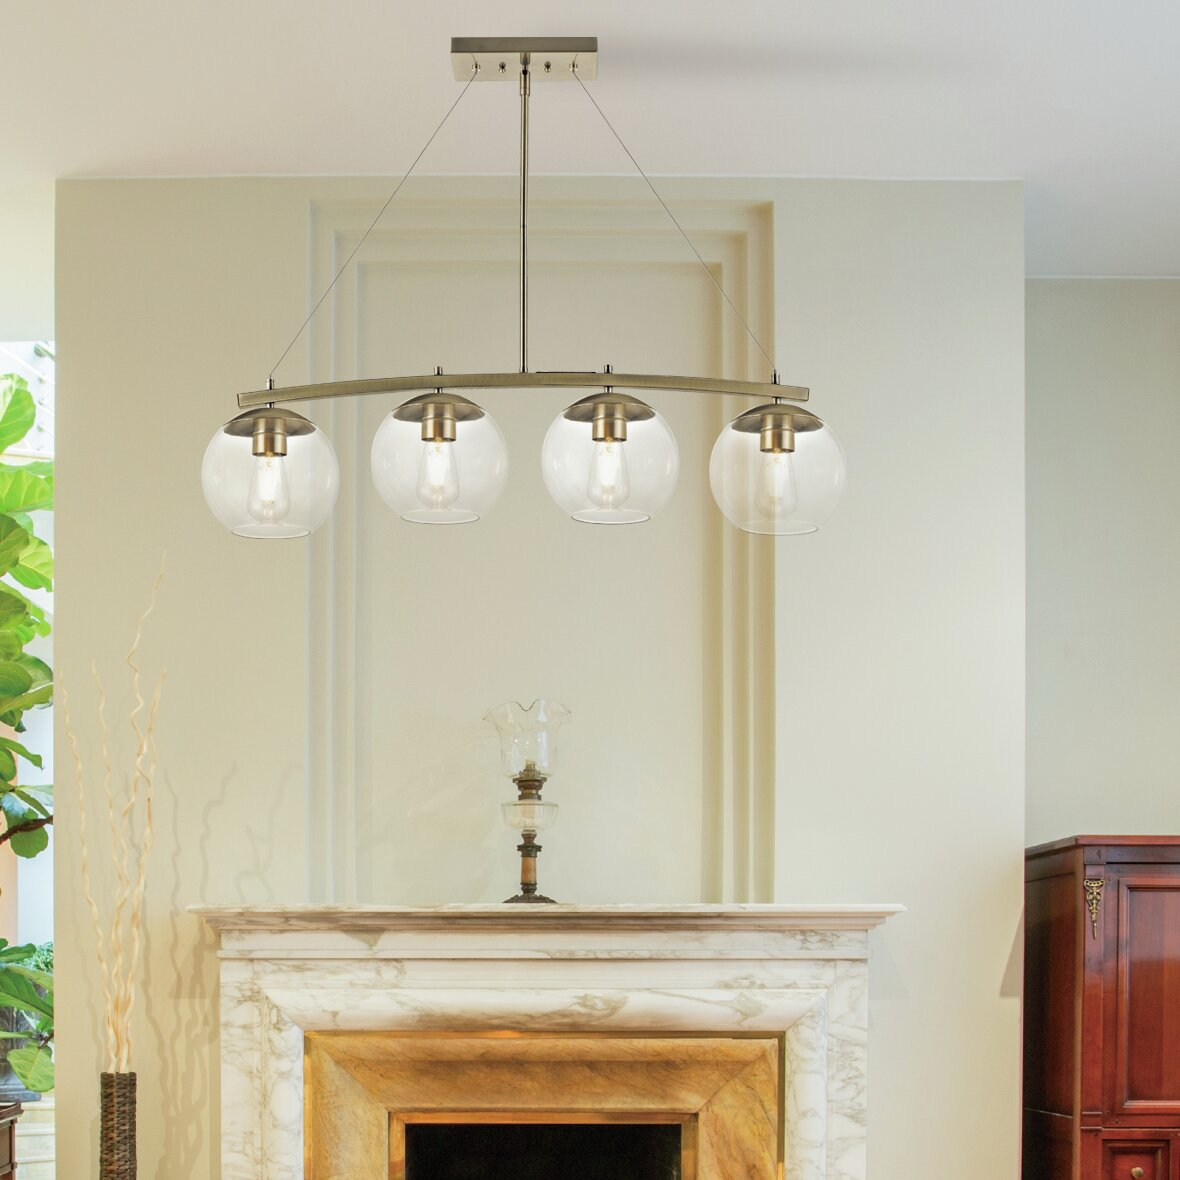 Antique Brass Clear Glass Shade Kitchen Island Lighting You Ll Love In 2021 Wayfair